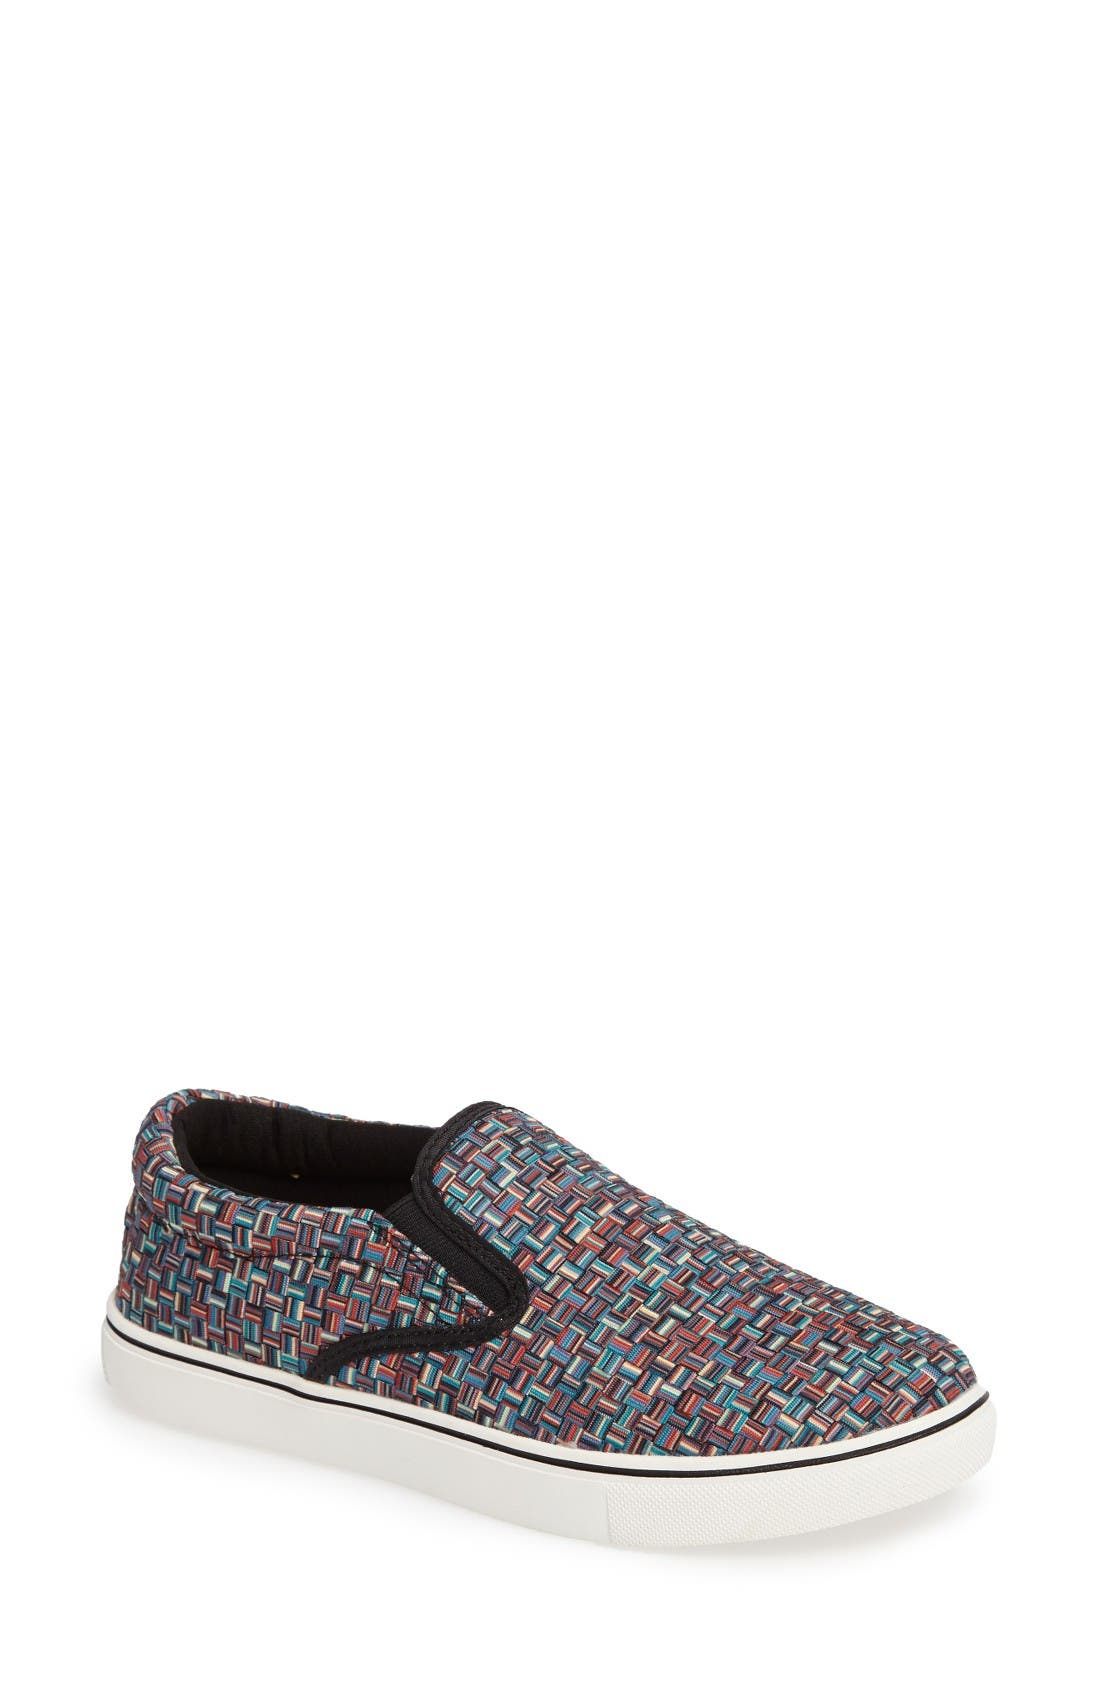 'Verona' Slip-On Sneaker,                         Main,                         color, Lapis Multi Fabric